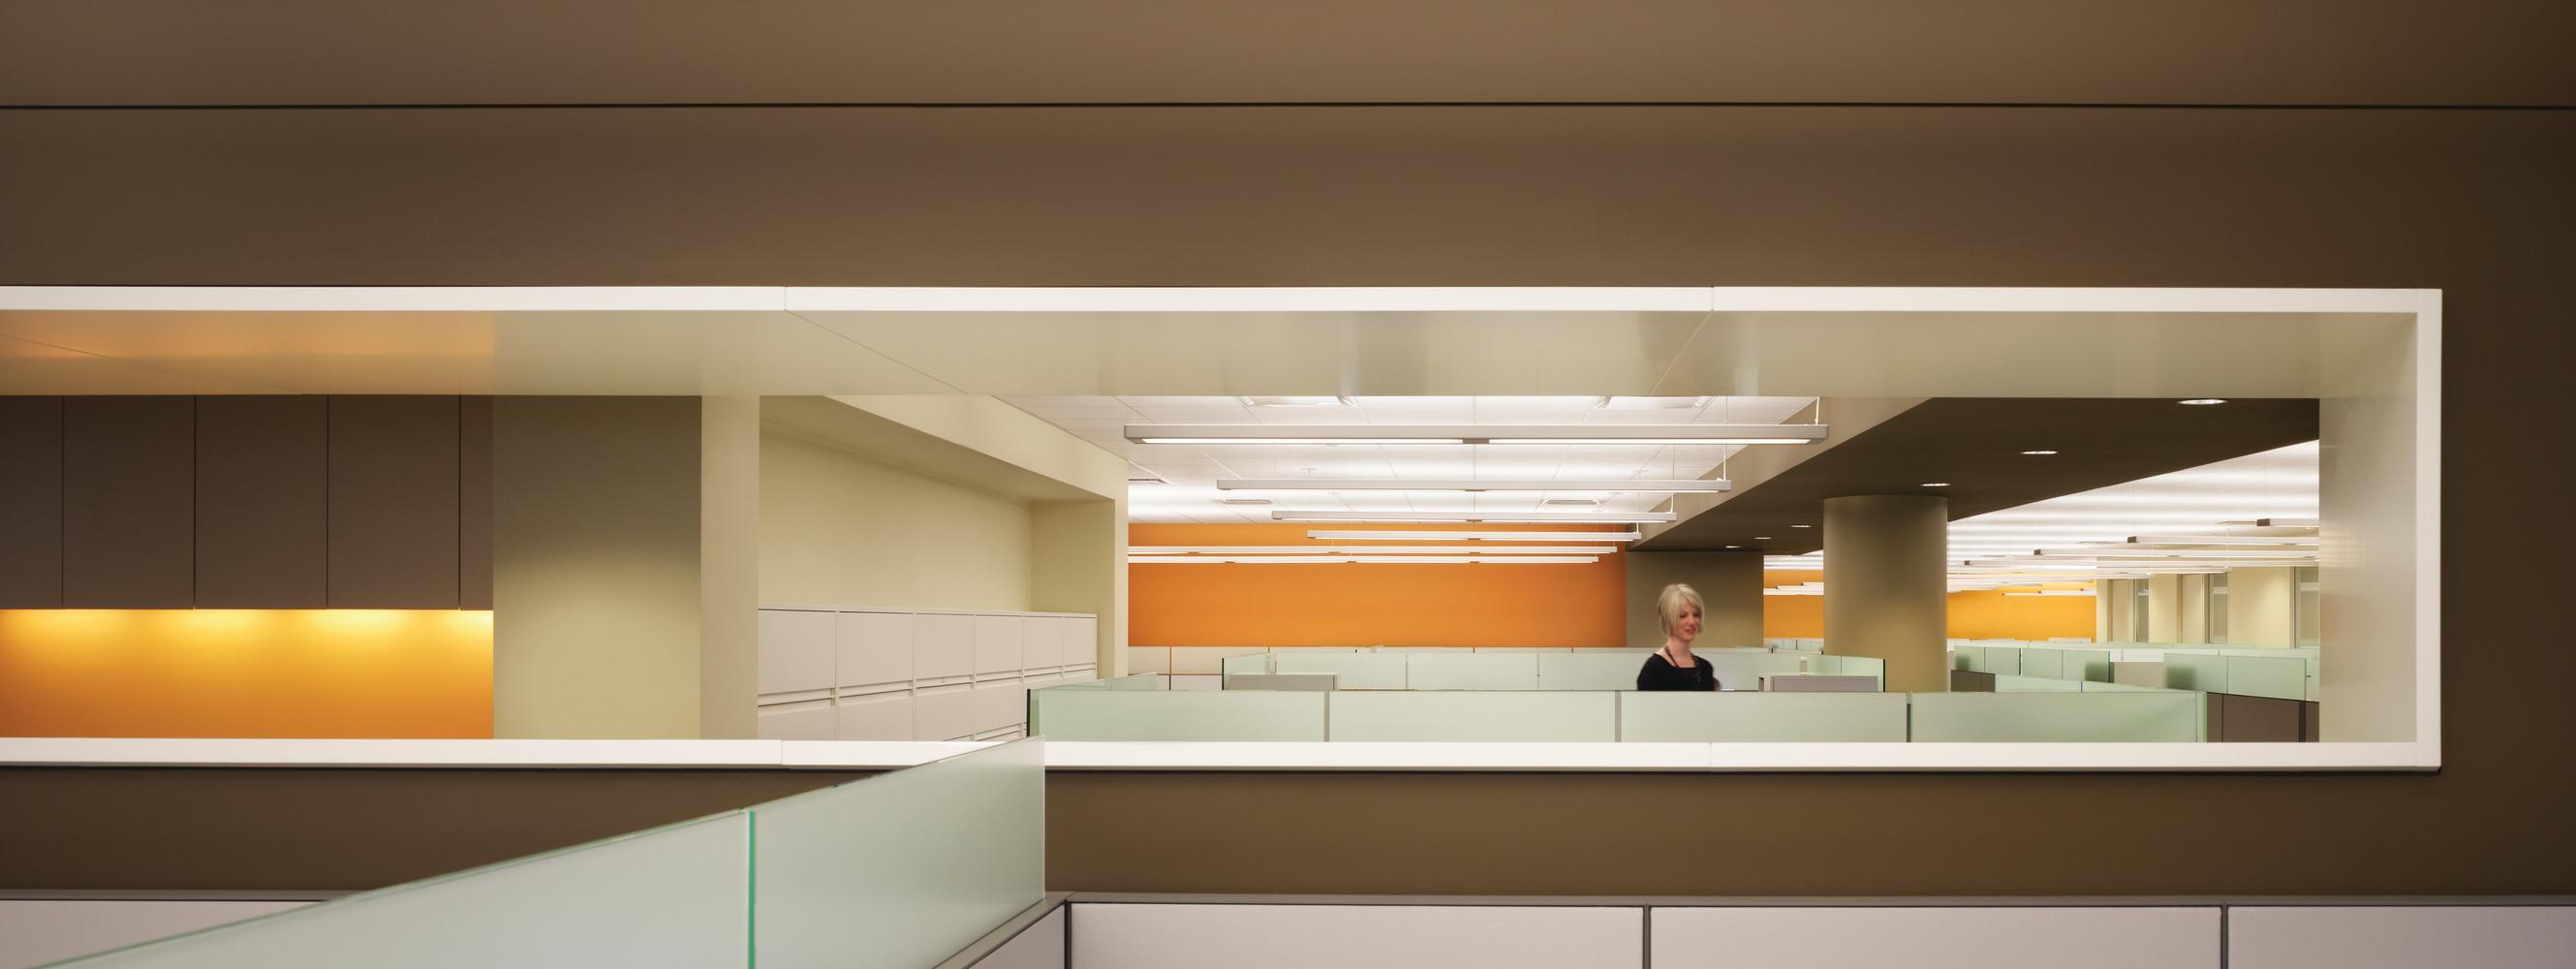 L6-L8_Bank Office_002.jpeg